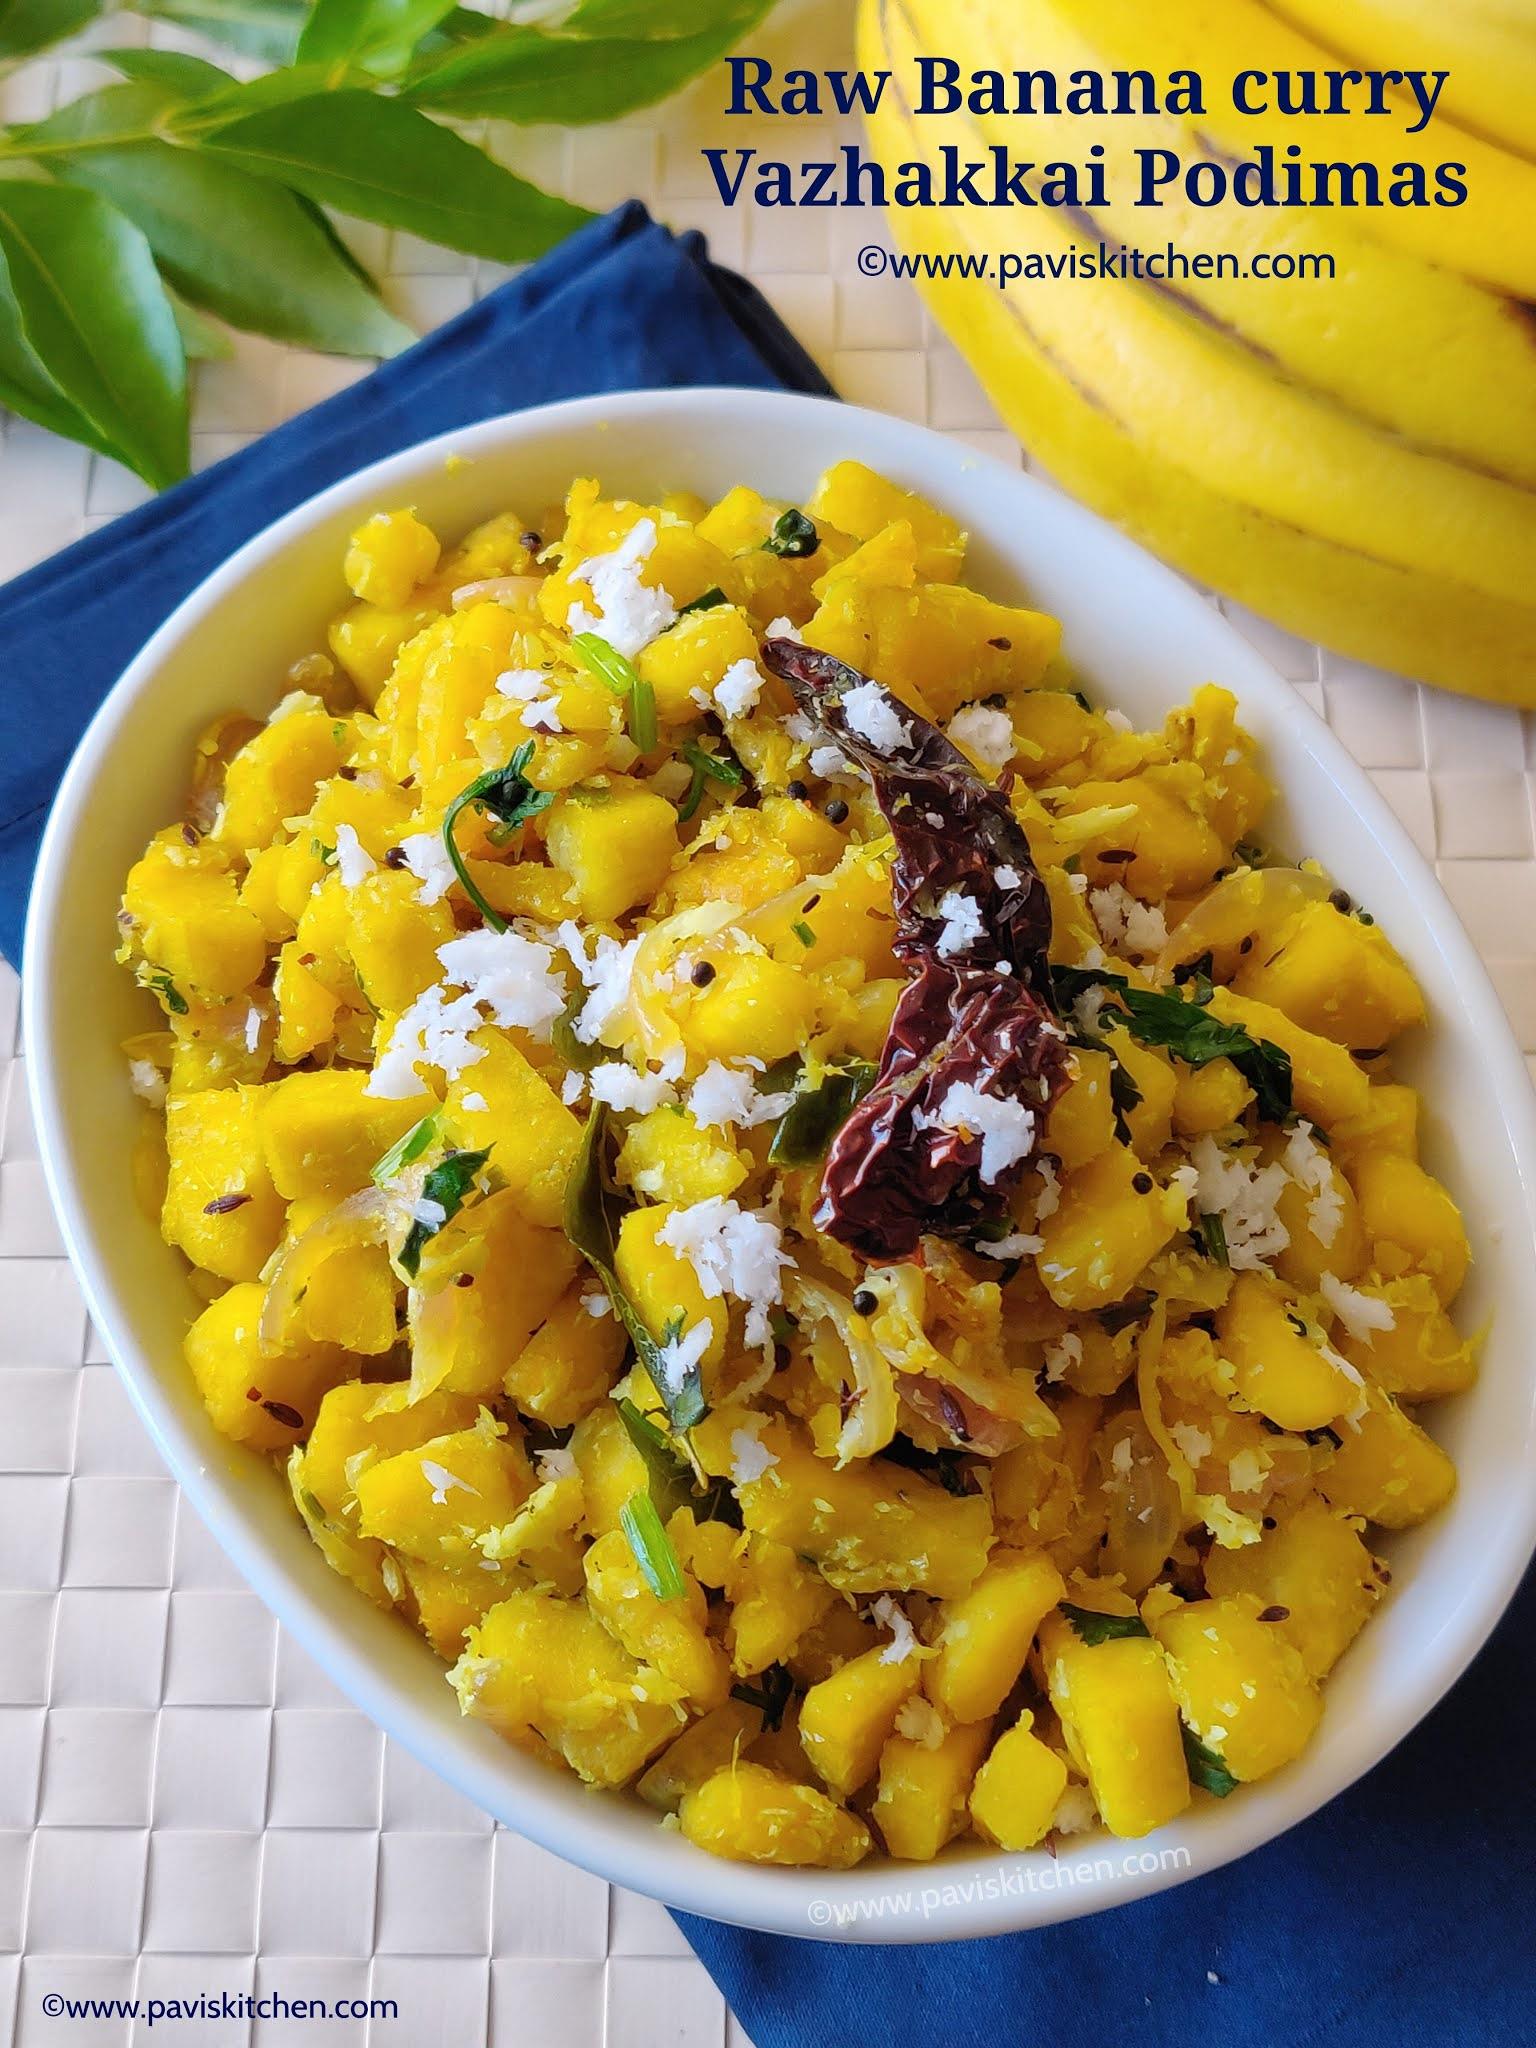 Vazhakkai podimas recipe   Valakkai Puttu   Plantain podimas recipe   Raw banana podimas recipe